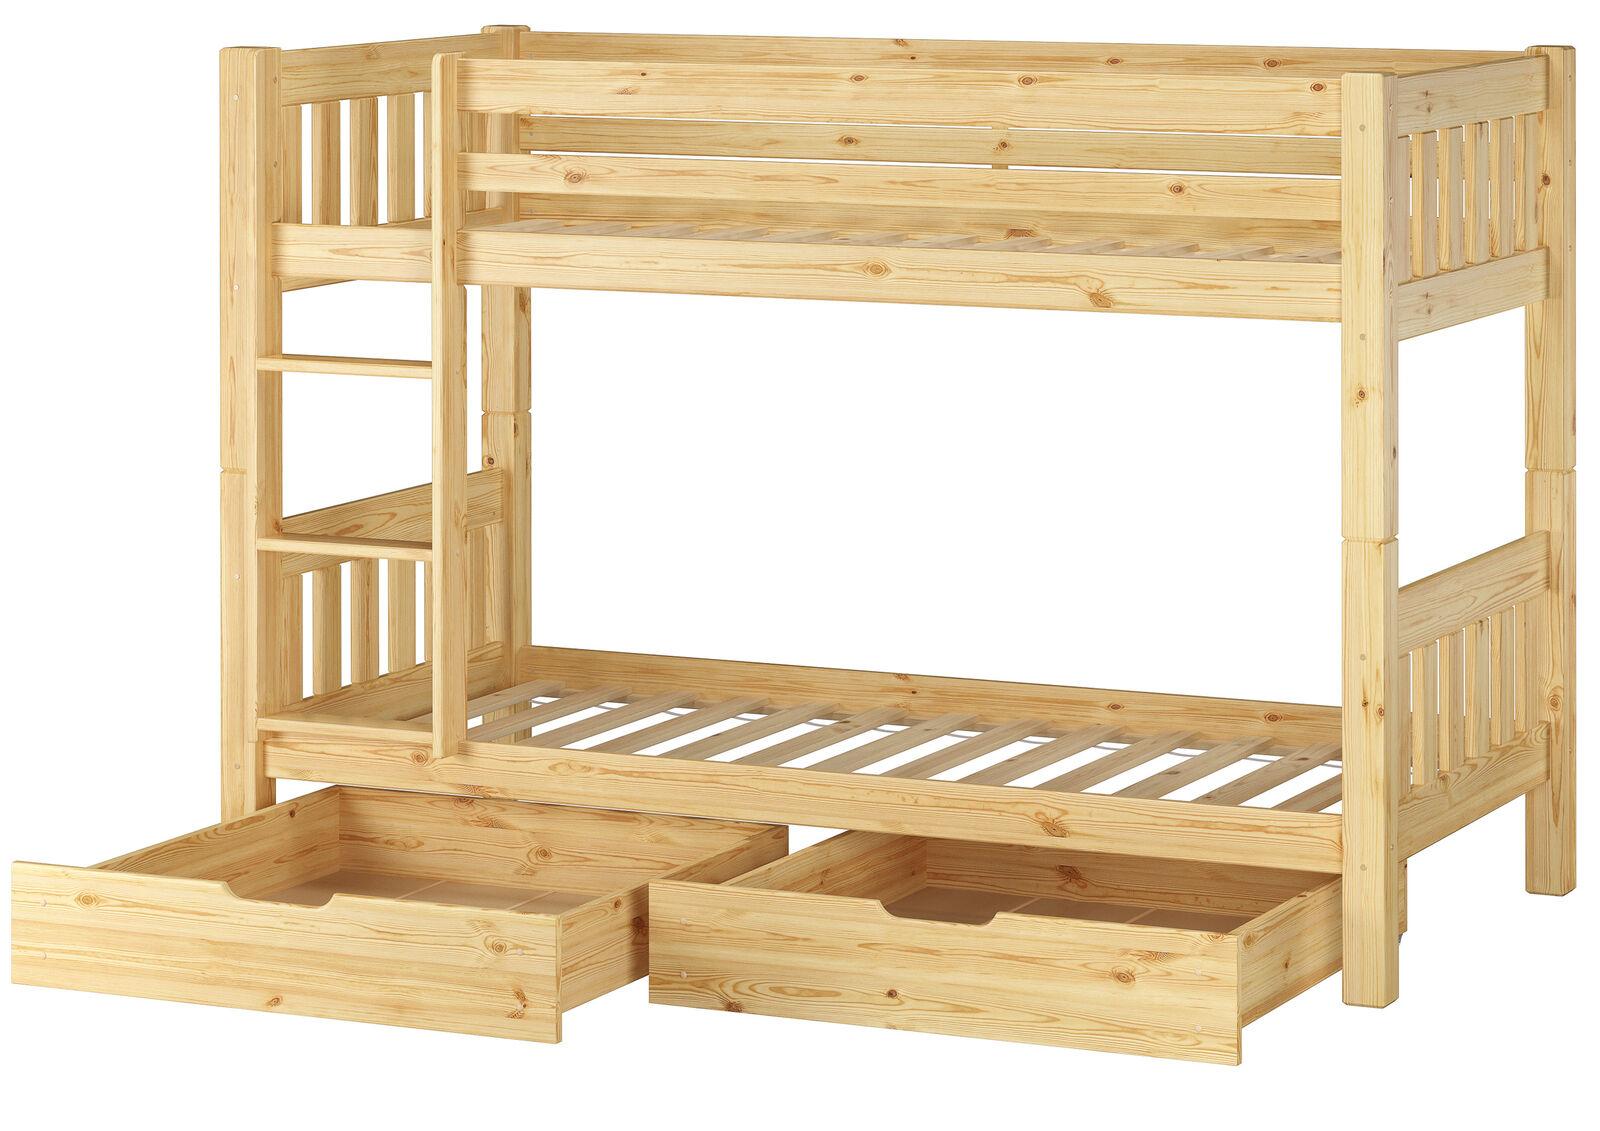 Superposé lit pin bois massif 90x200cm lits + bettkasten 60.06-09s2